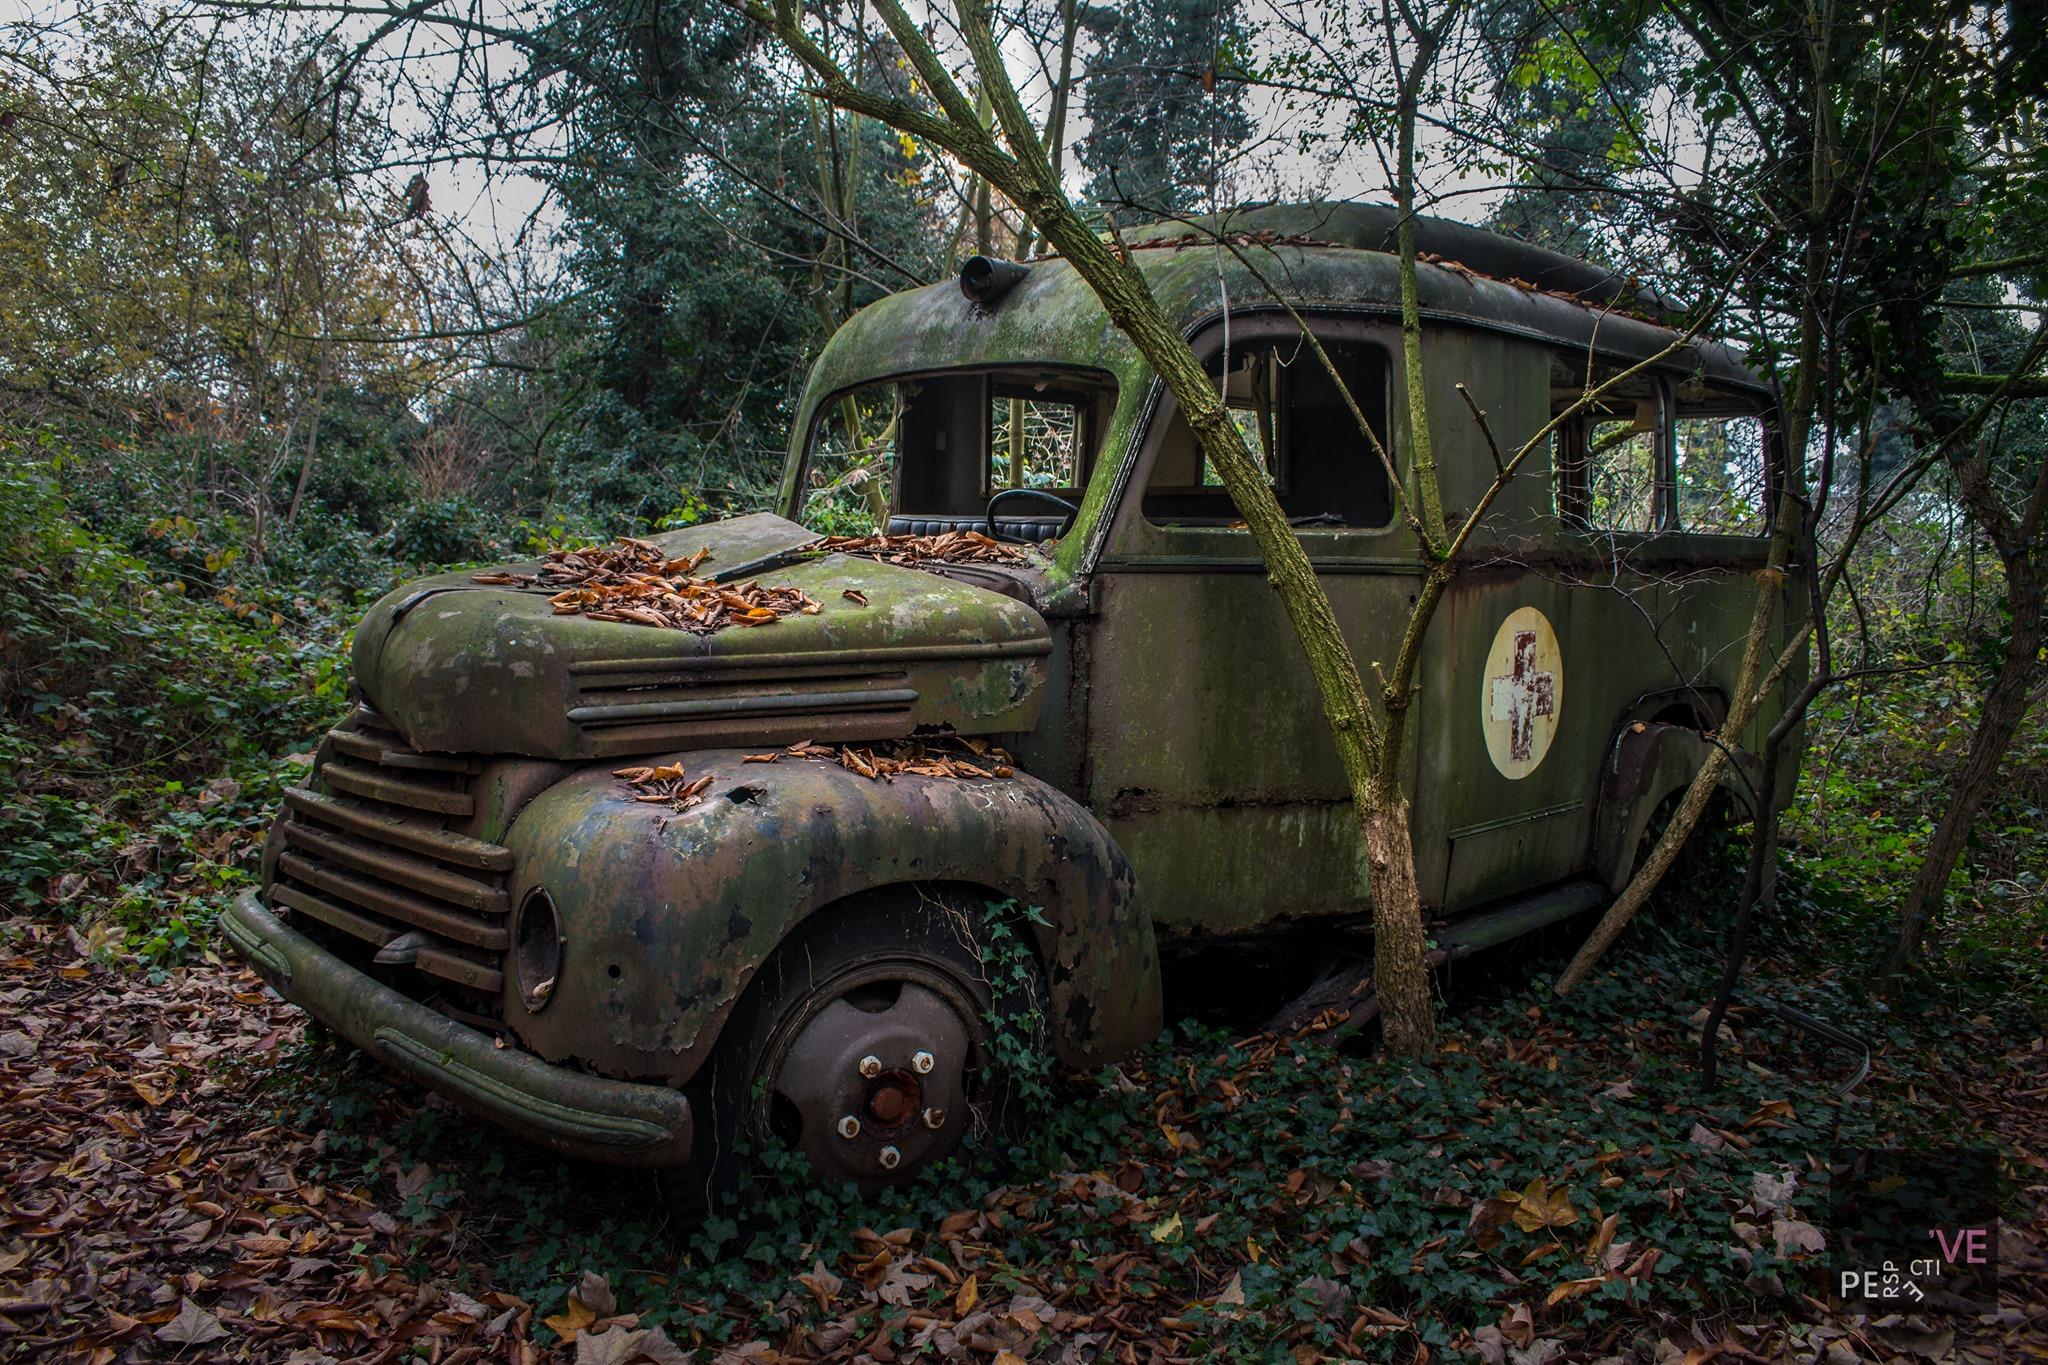 Ford-Koln-ambulance-G39T-V-8-1951-39-zijn-er-gemaakt-van--(2)